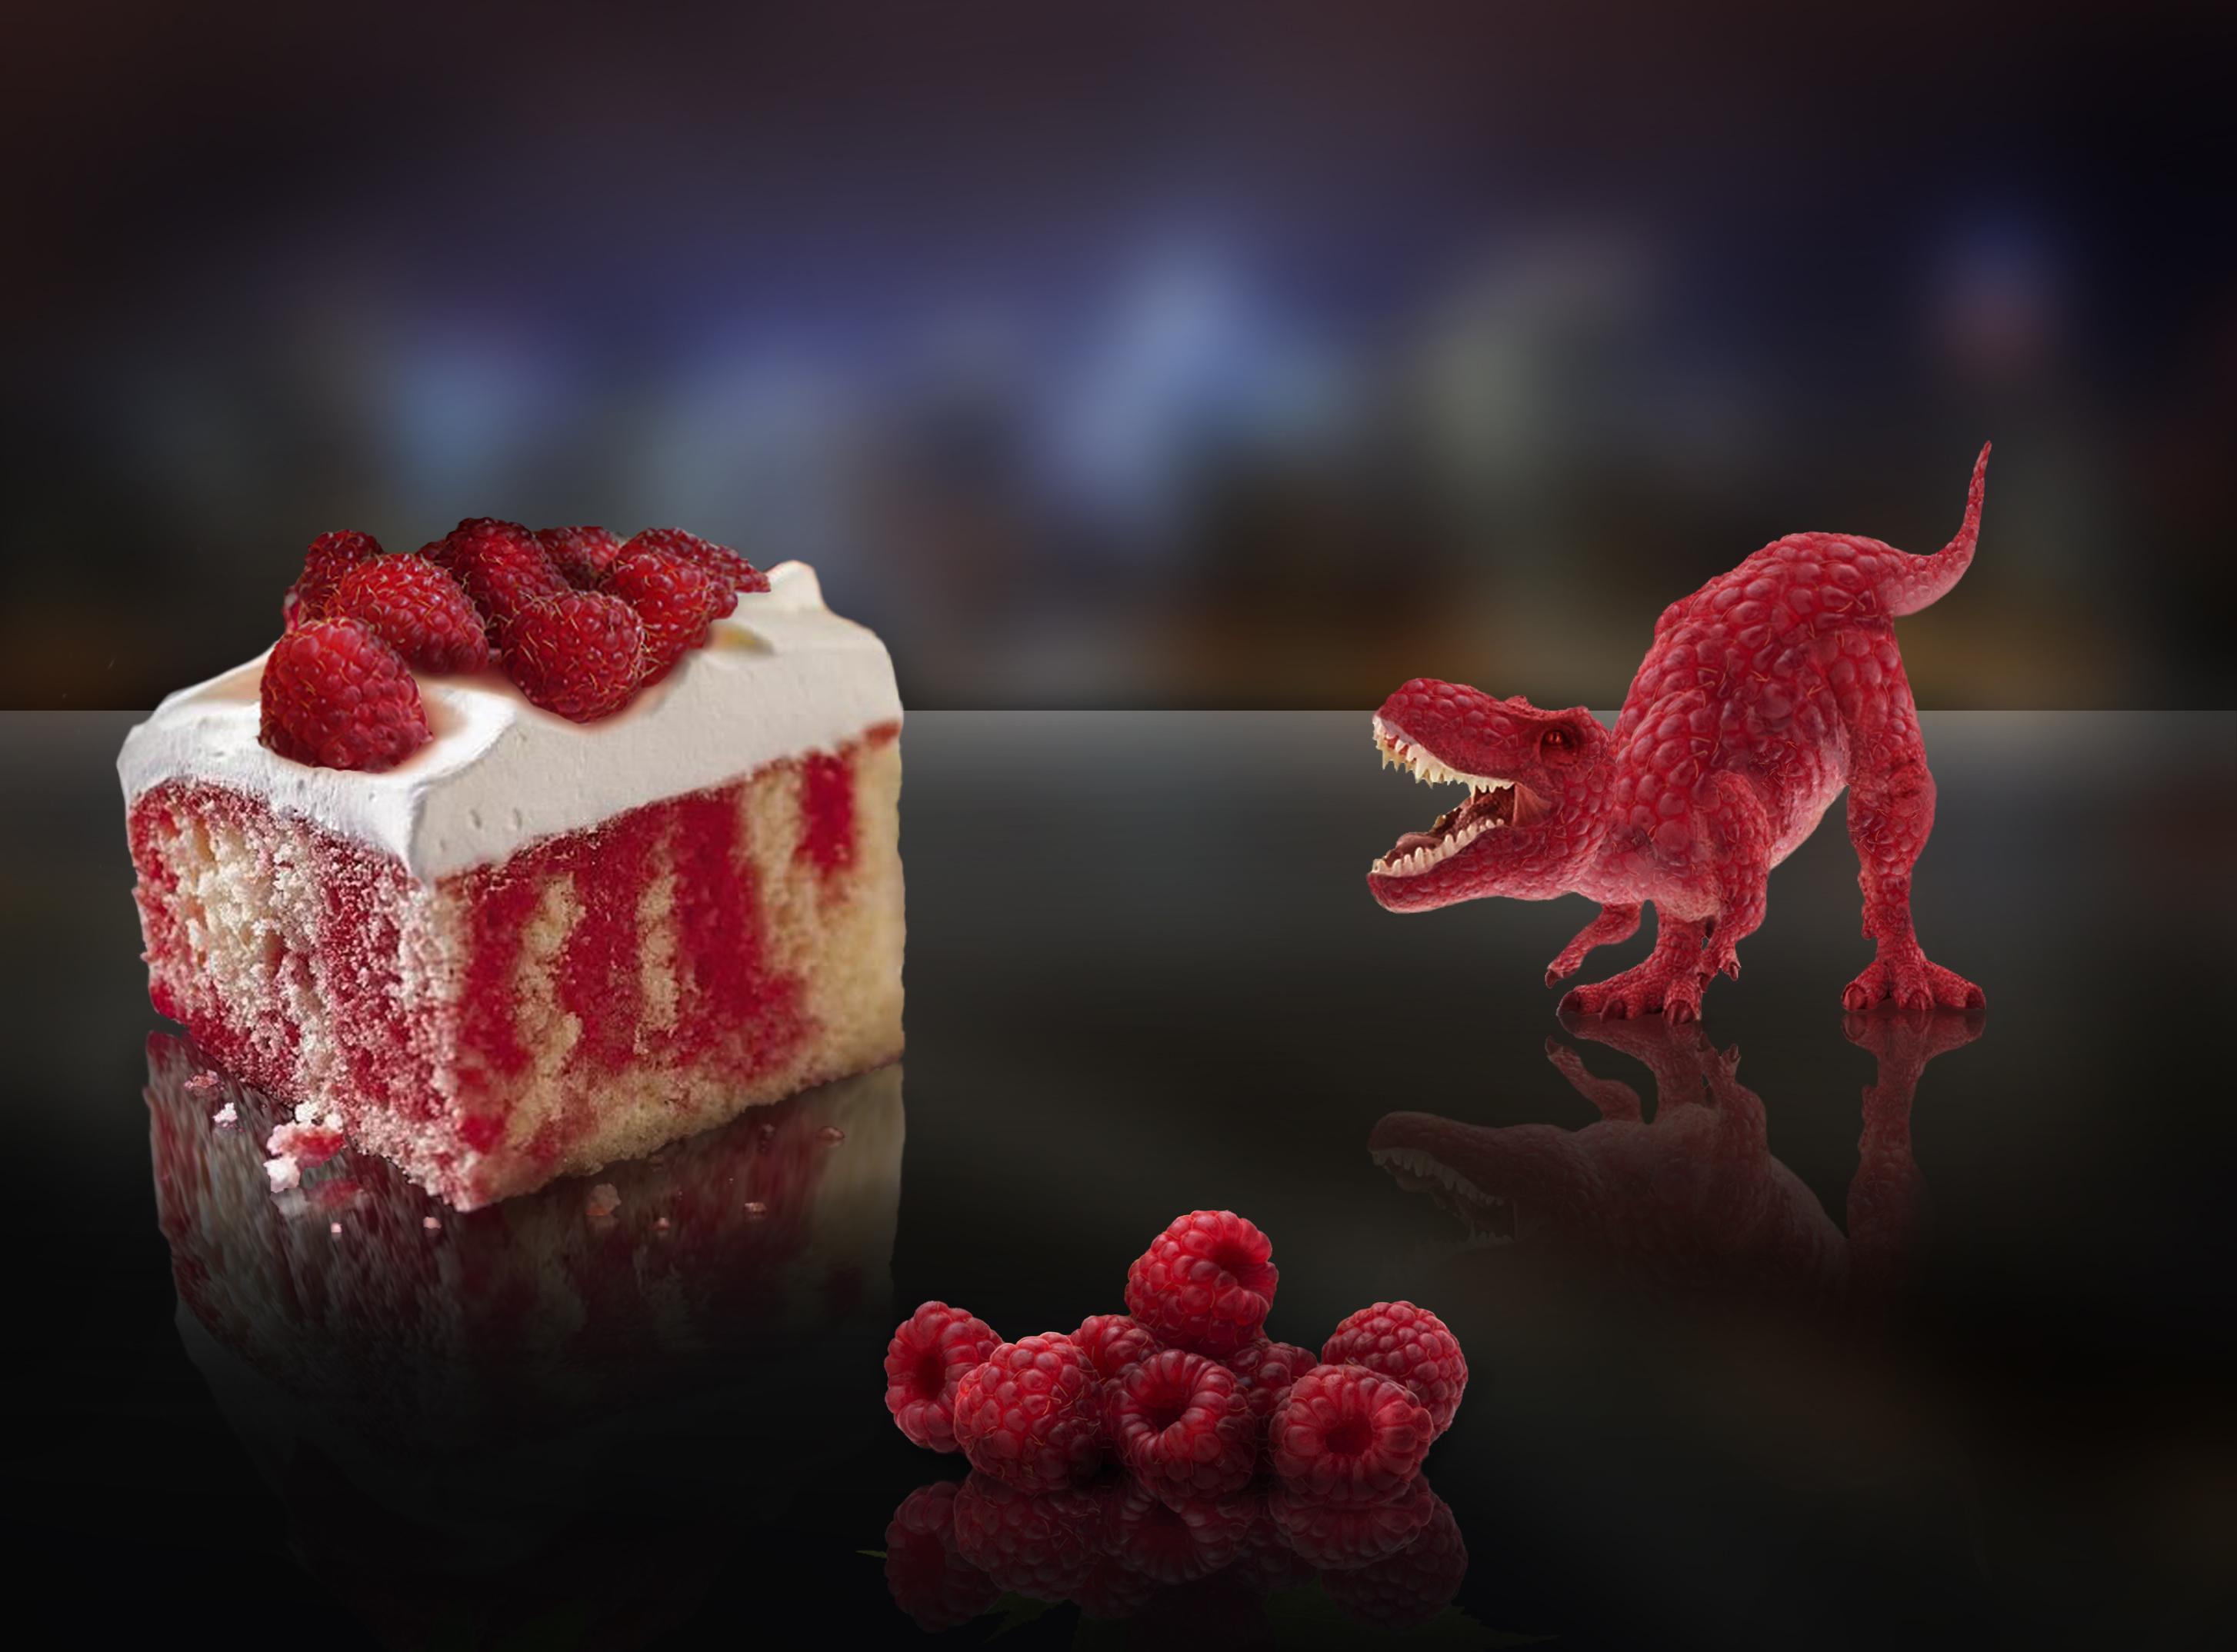 Raspberry Dino